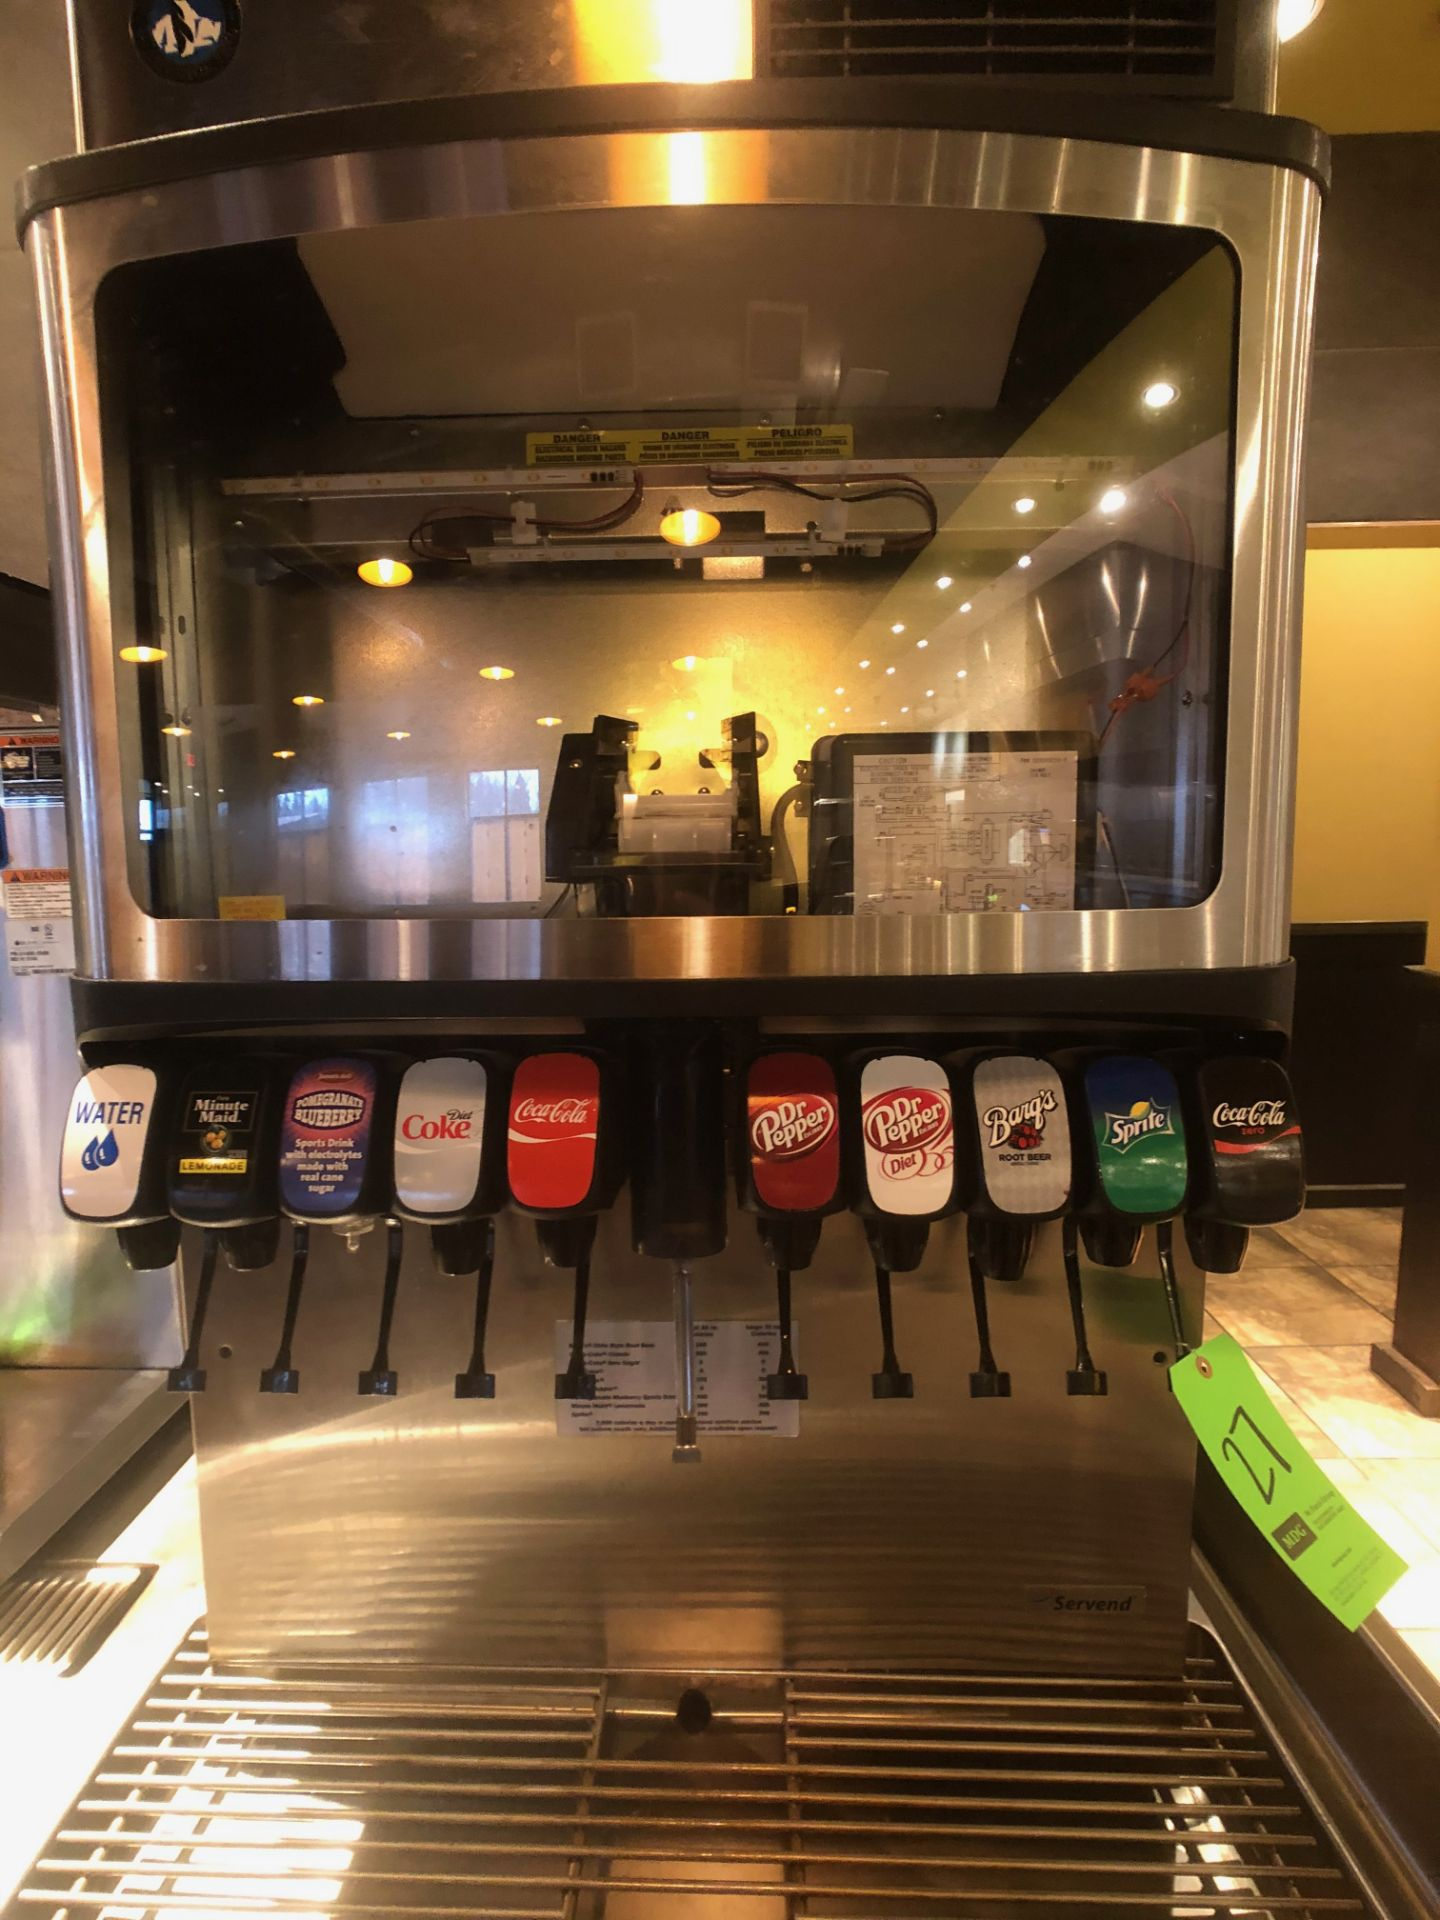 Manitowoc Beverage Systems 10-Valve Soft Drink Dispenser, Model SV250, S/N 610202454, with Hoshizaki - Image 2 of 10